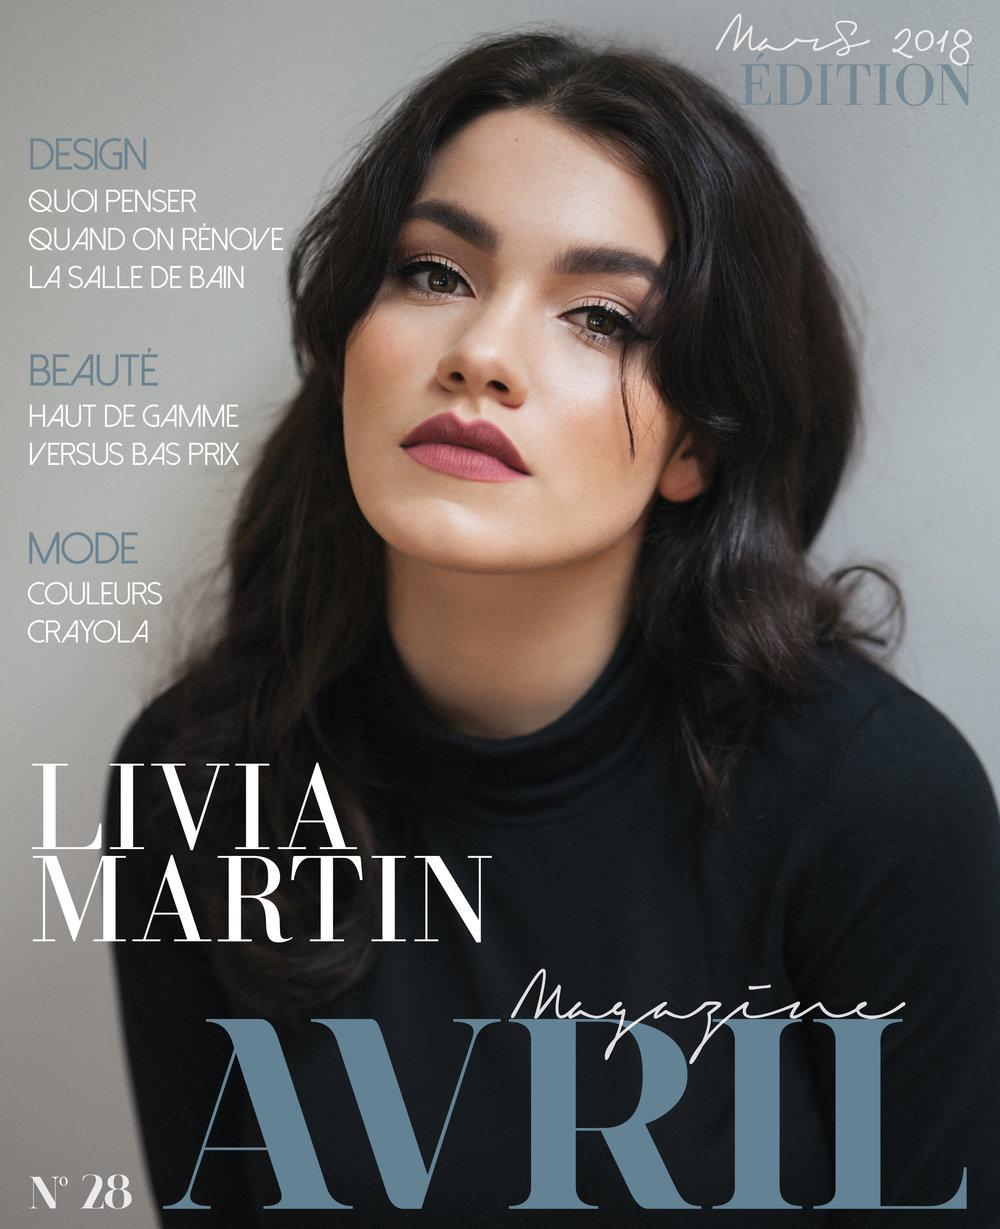 Cover-Avril_Magazine_Livia_Martin_Mars_2018.jpg